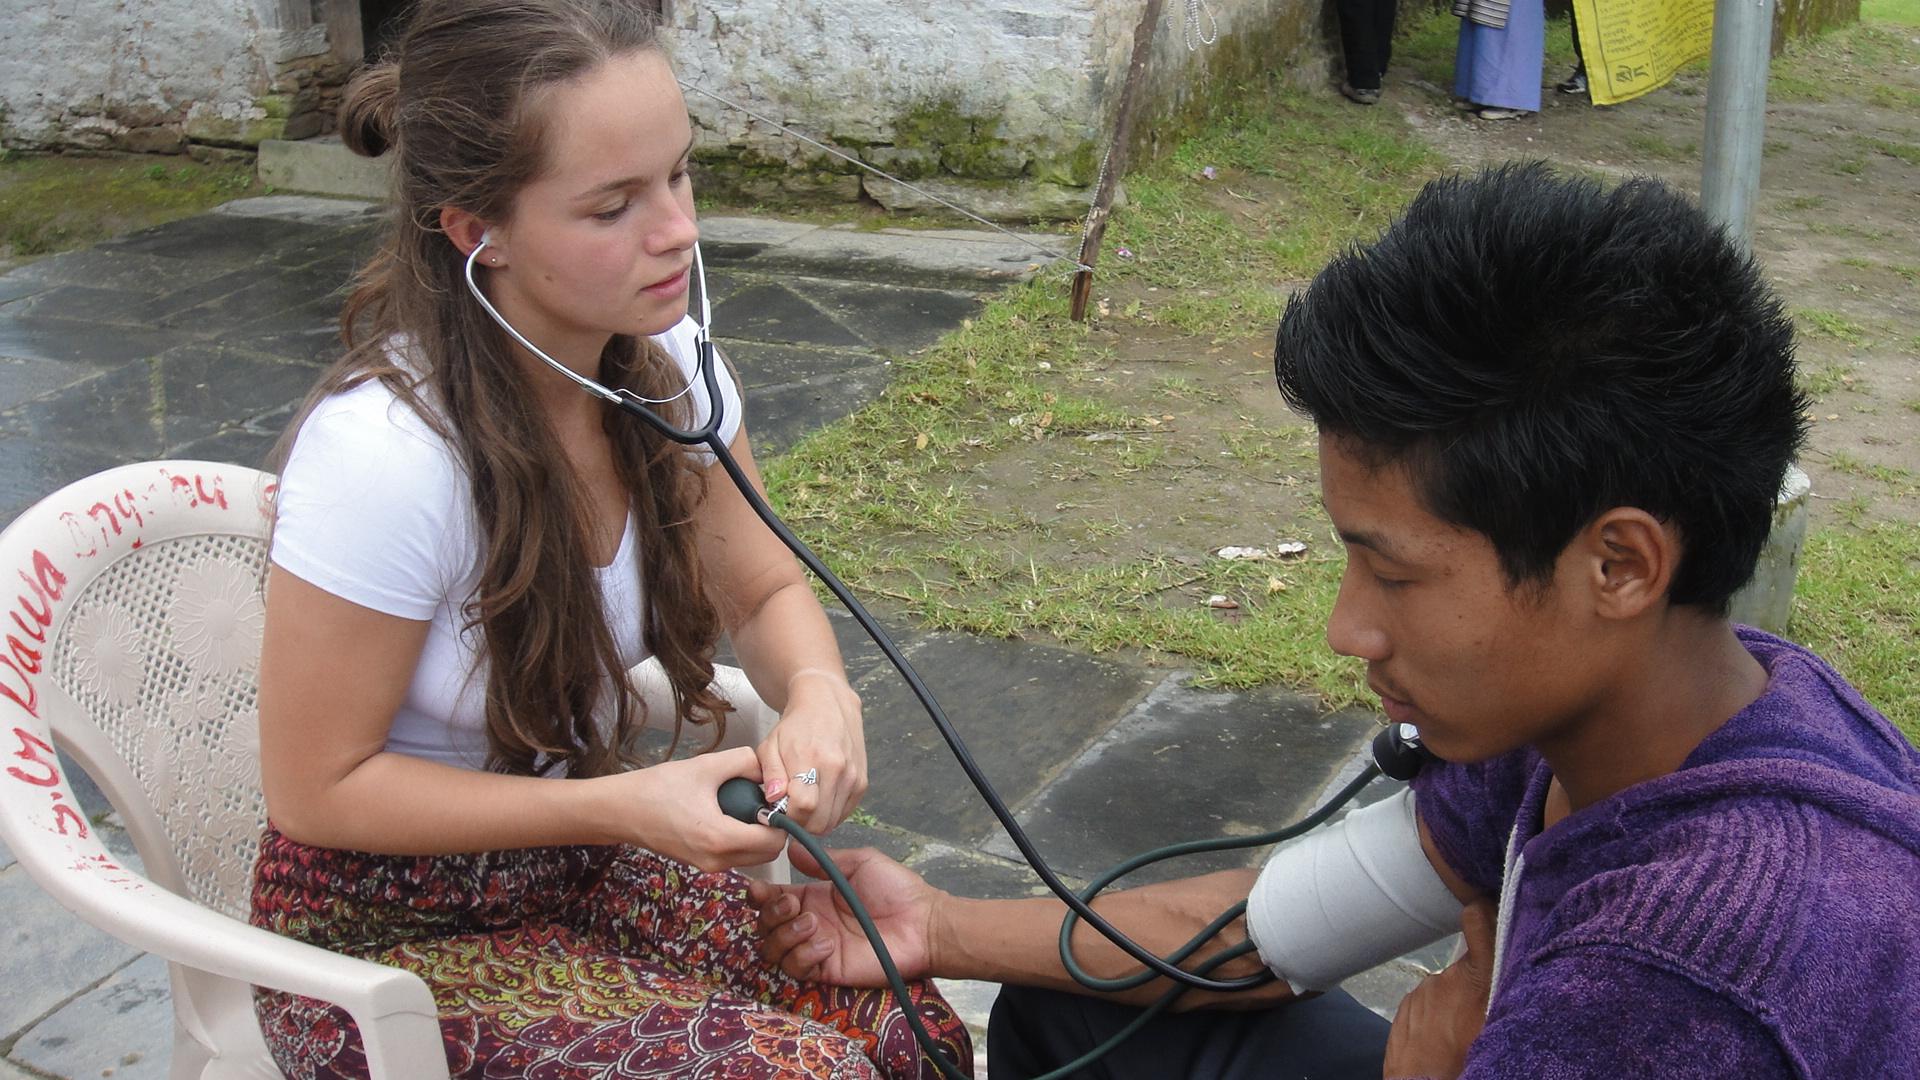 Student_Medical_Volunteering_Adventure_Alternative_Nepal.JPG